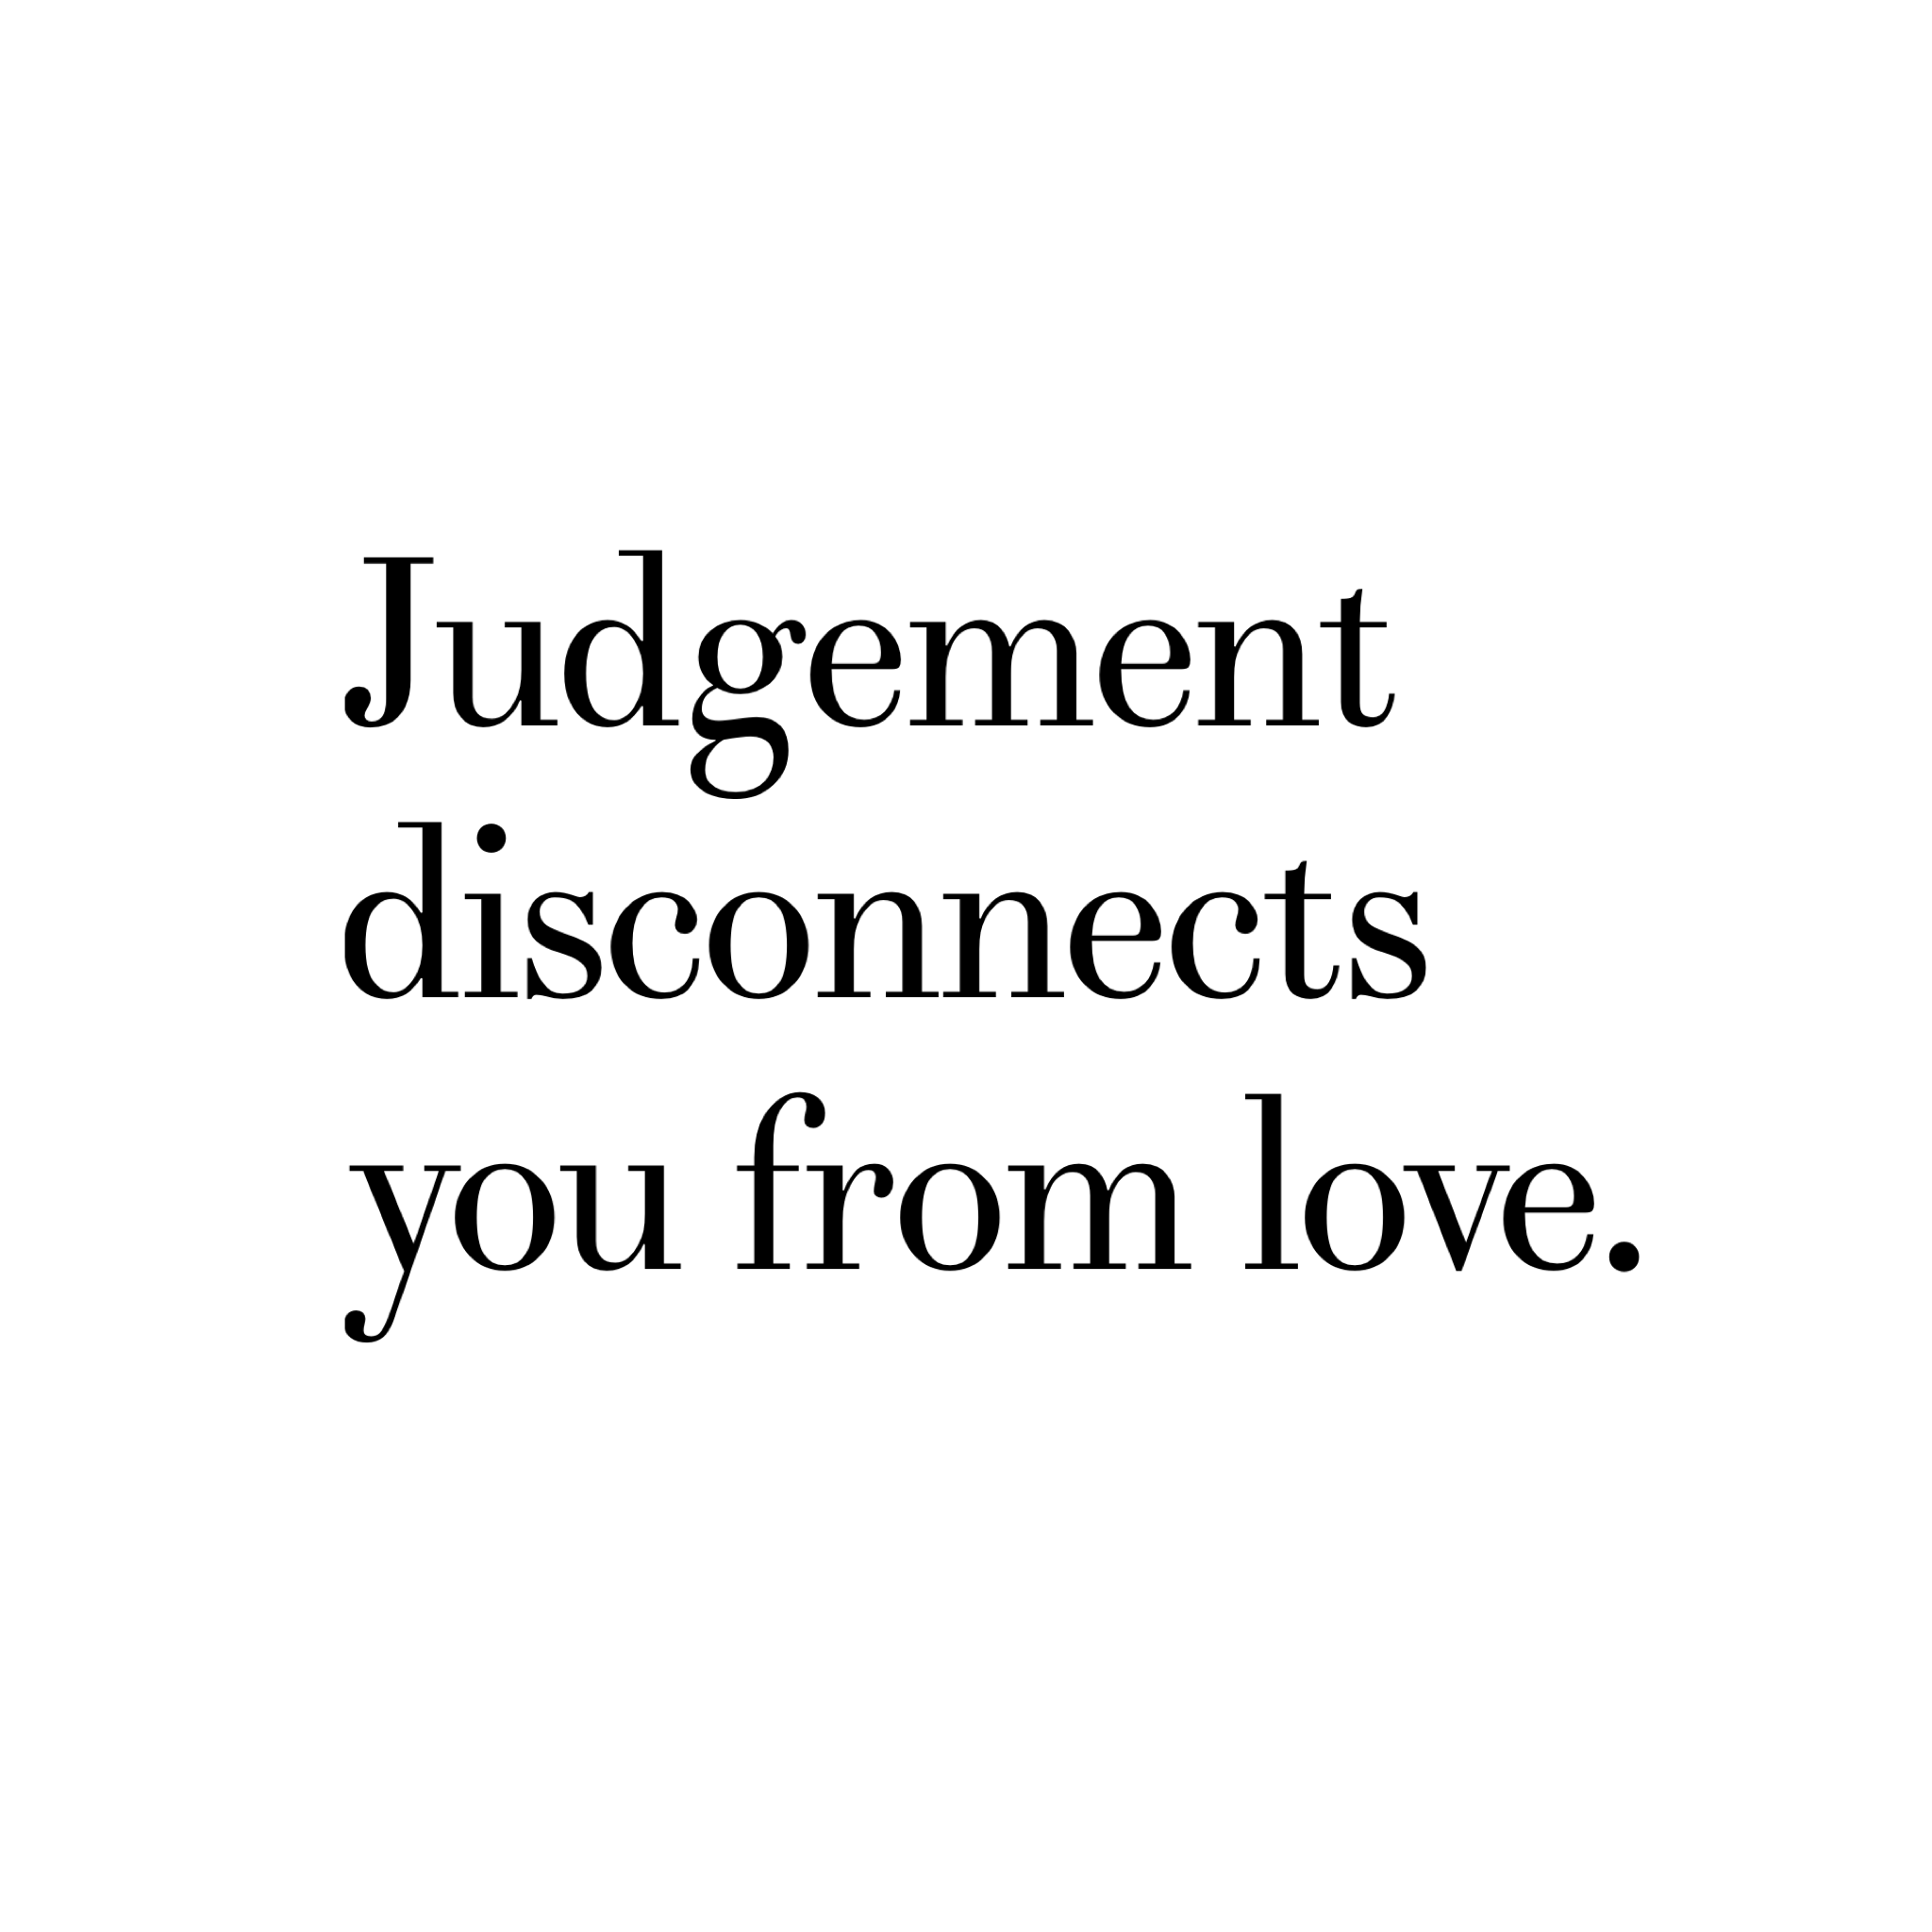 Judgement  Wisdom quotes, Judgement quotes, Powerful words